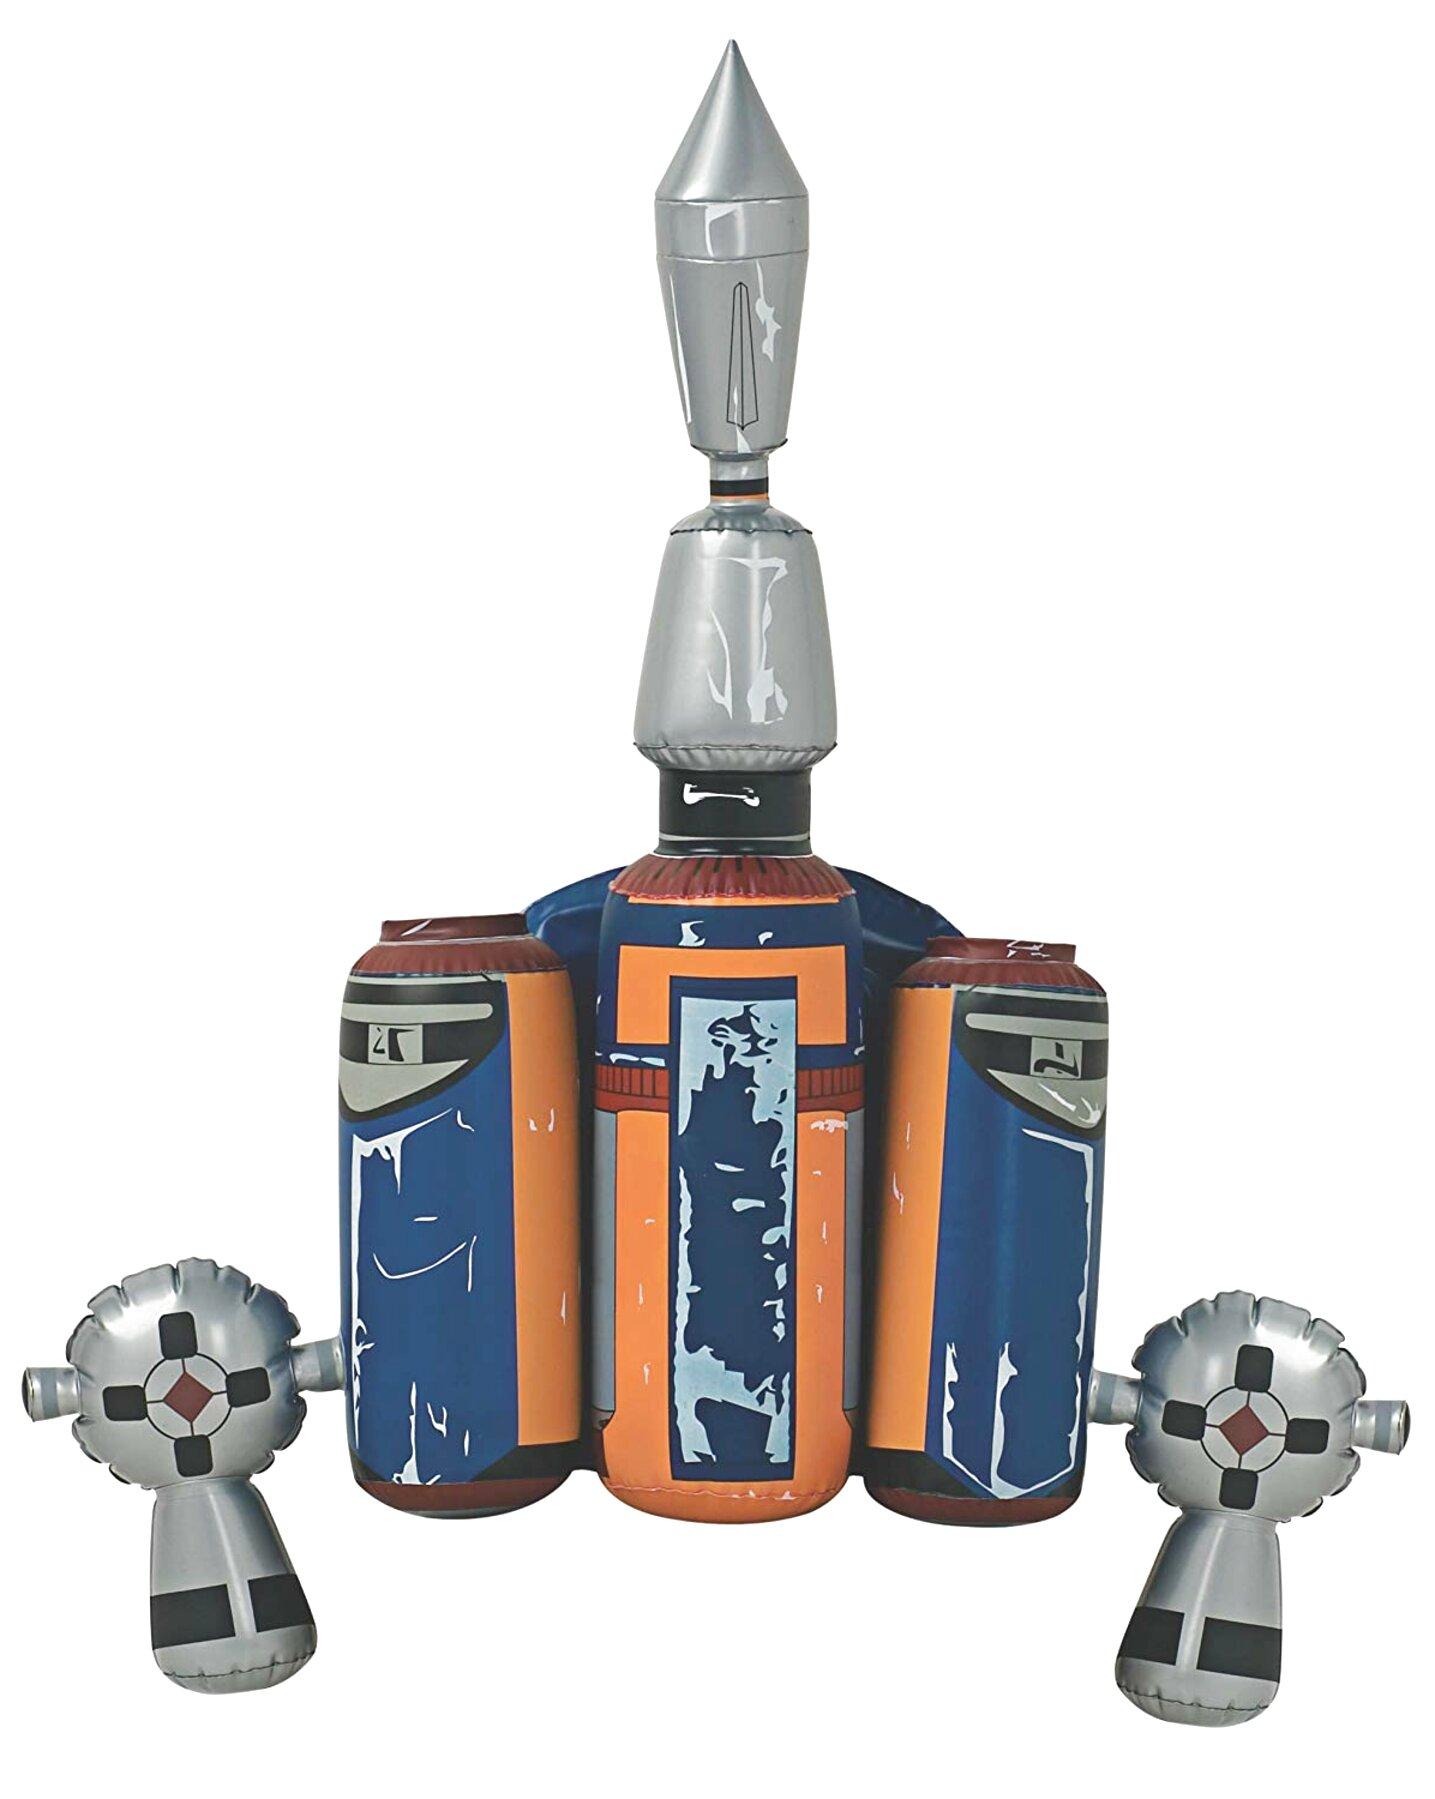 Boba Fett Jetpack for sale in Canada